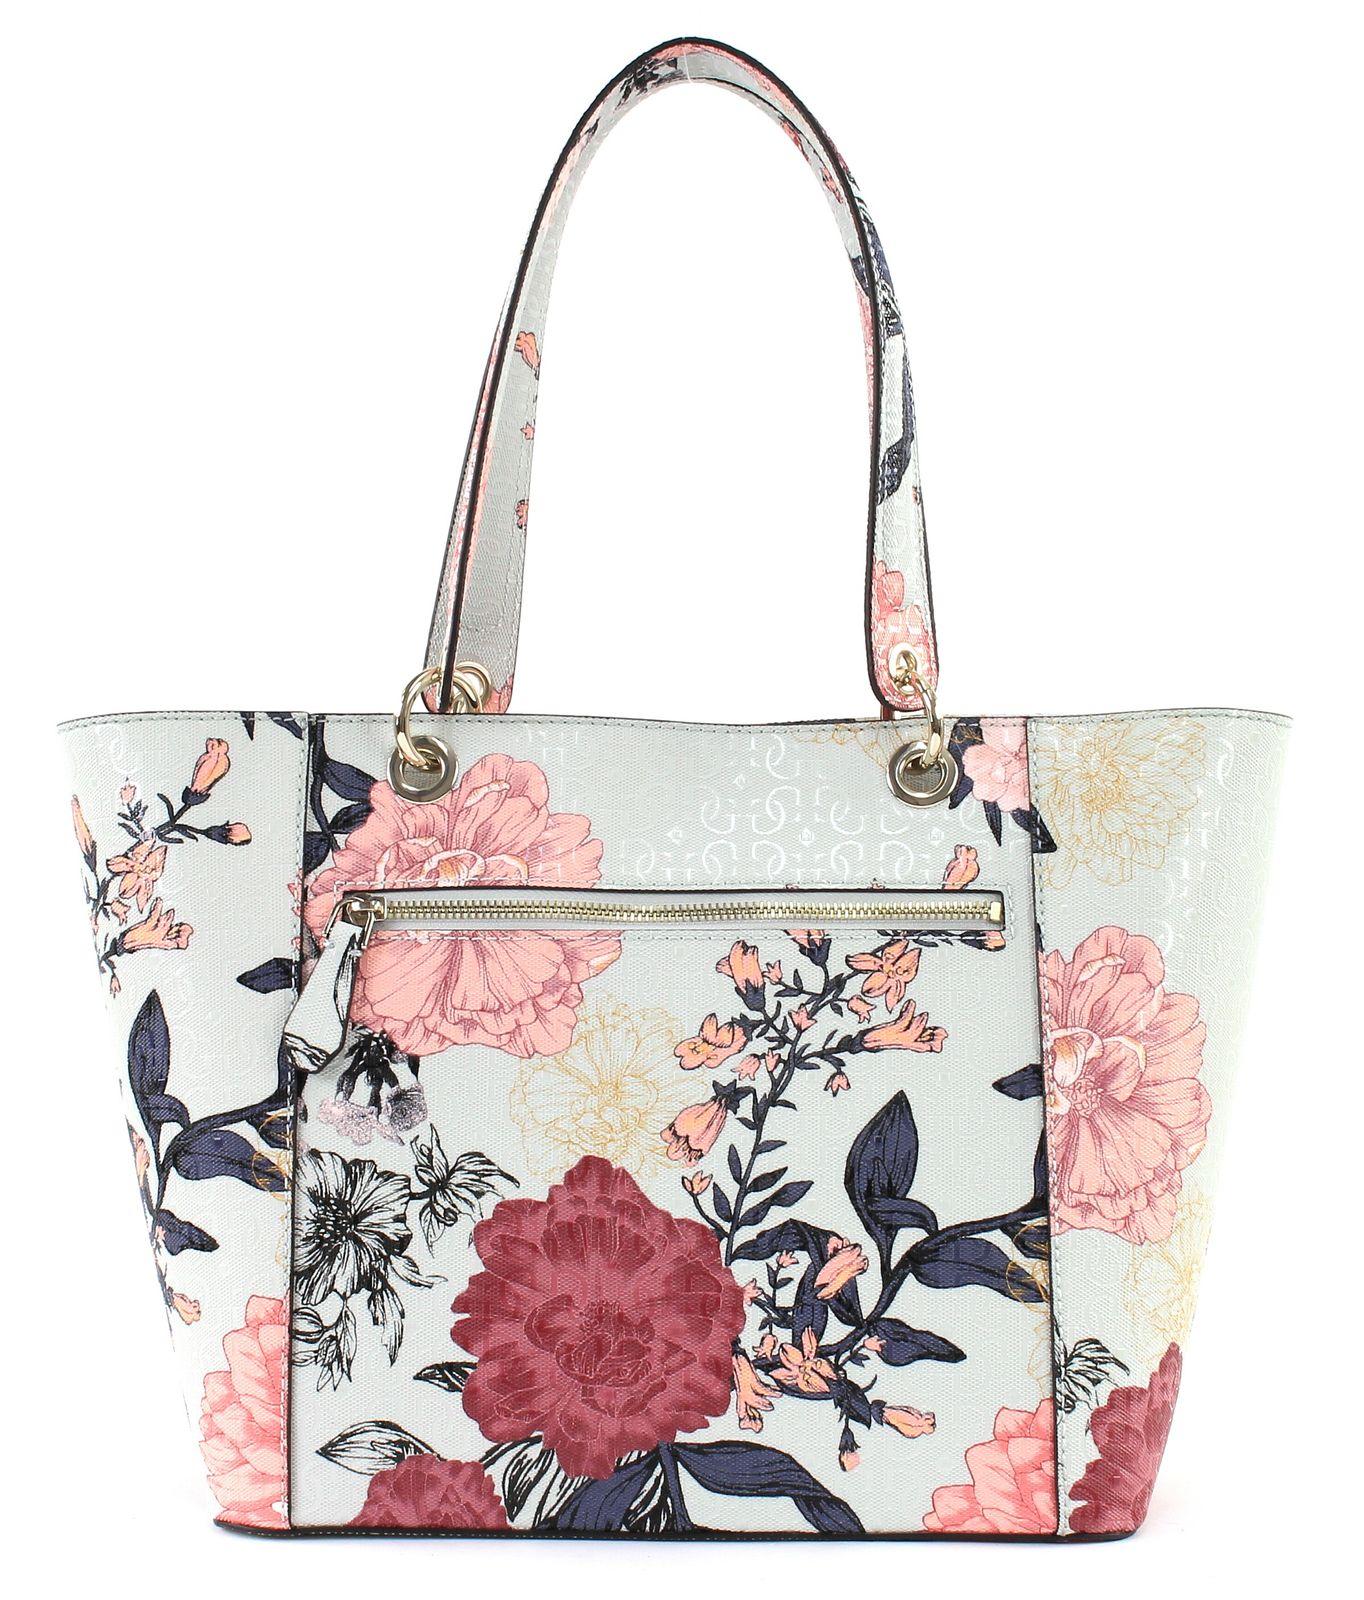 GUESS Shopper Bag Kamryn Tote Grey Floral | EBay